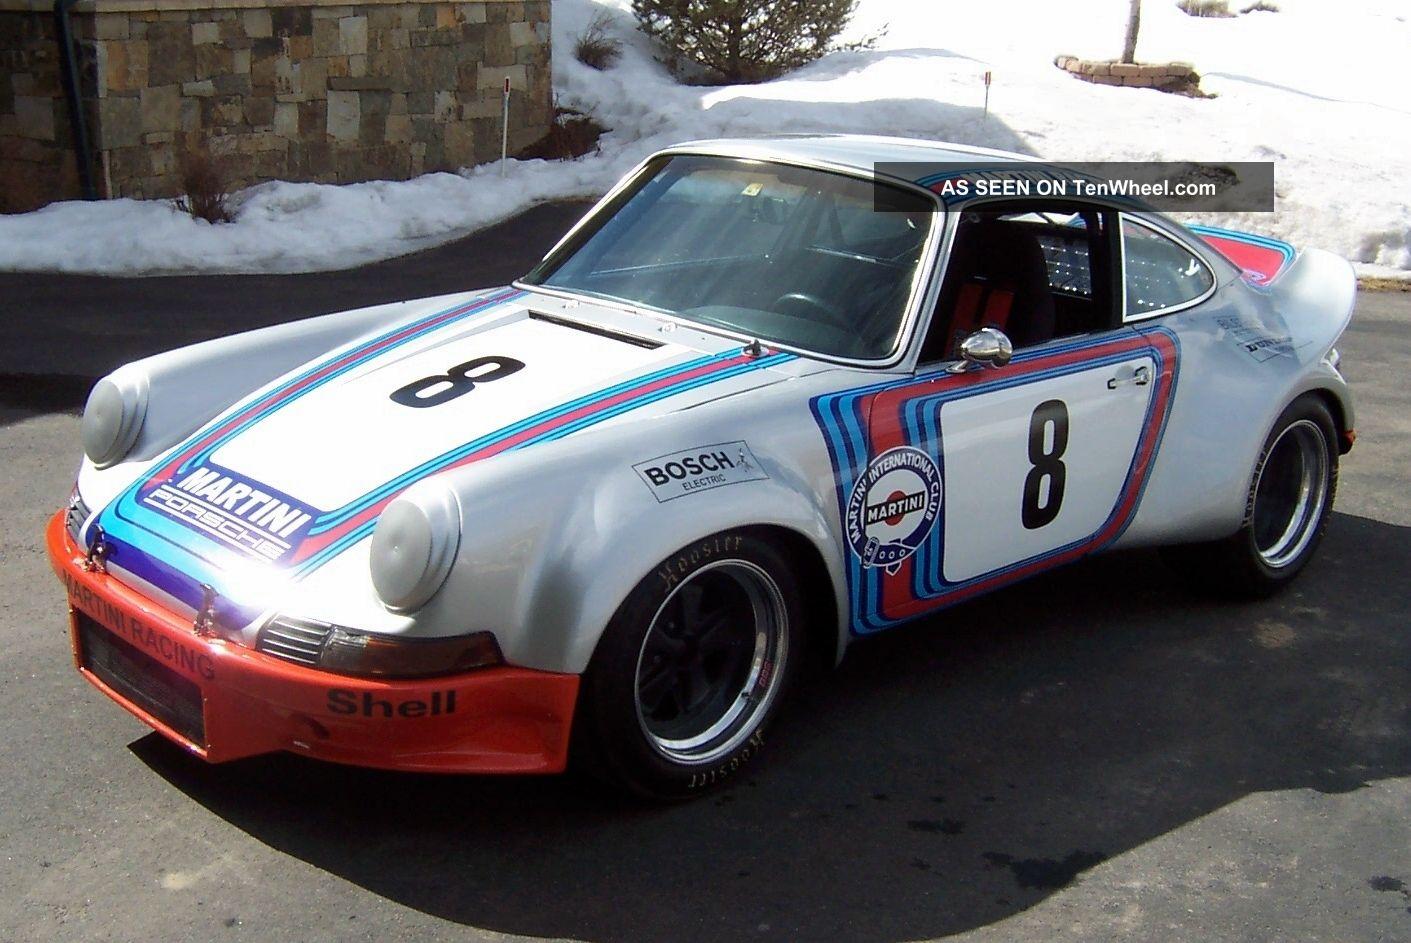 1971 Porsche 911 Vintage Road Racing Car, Martini Racing Tribute,